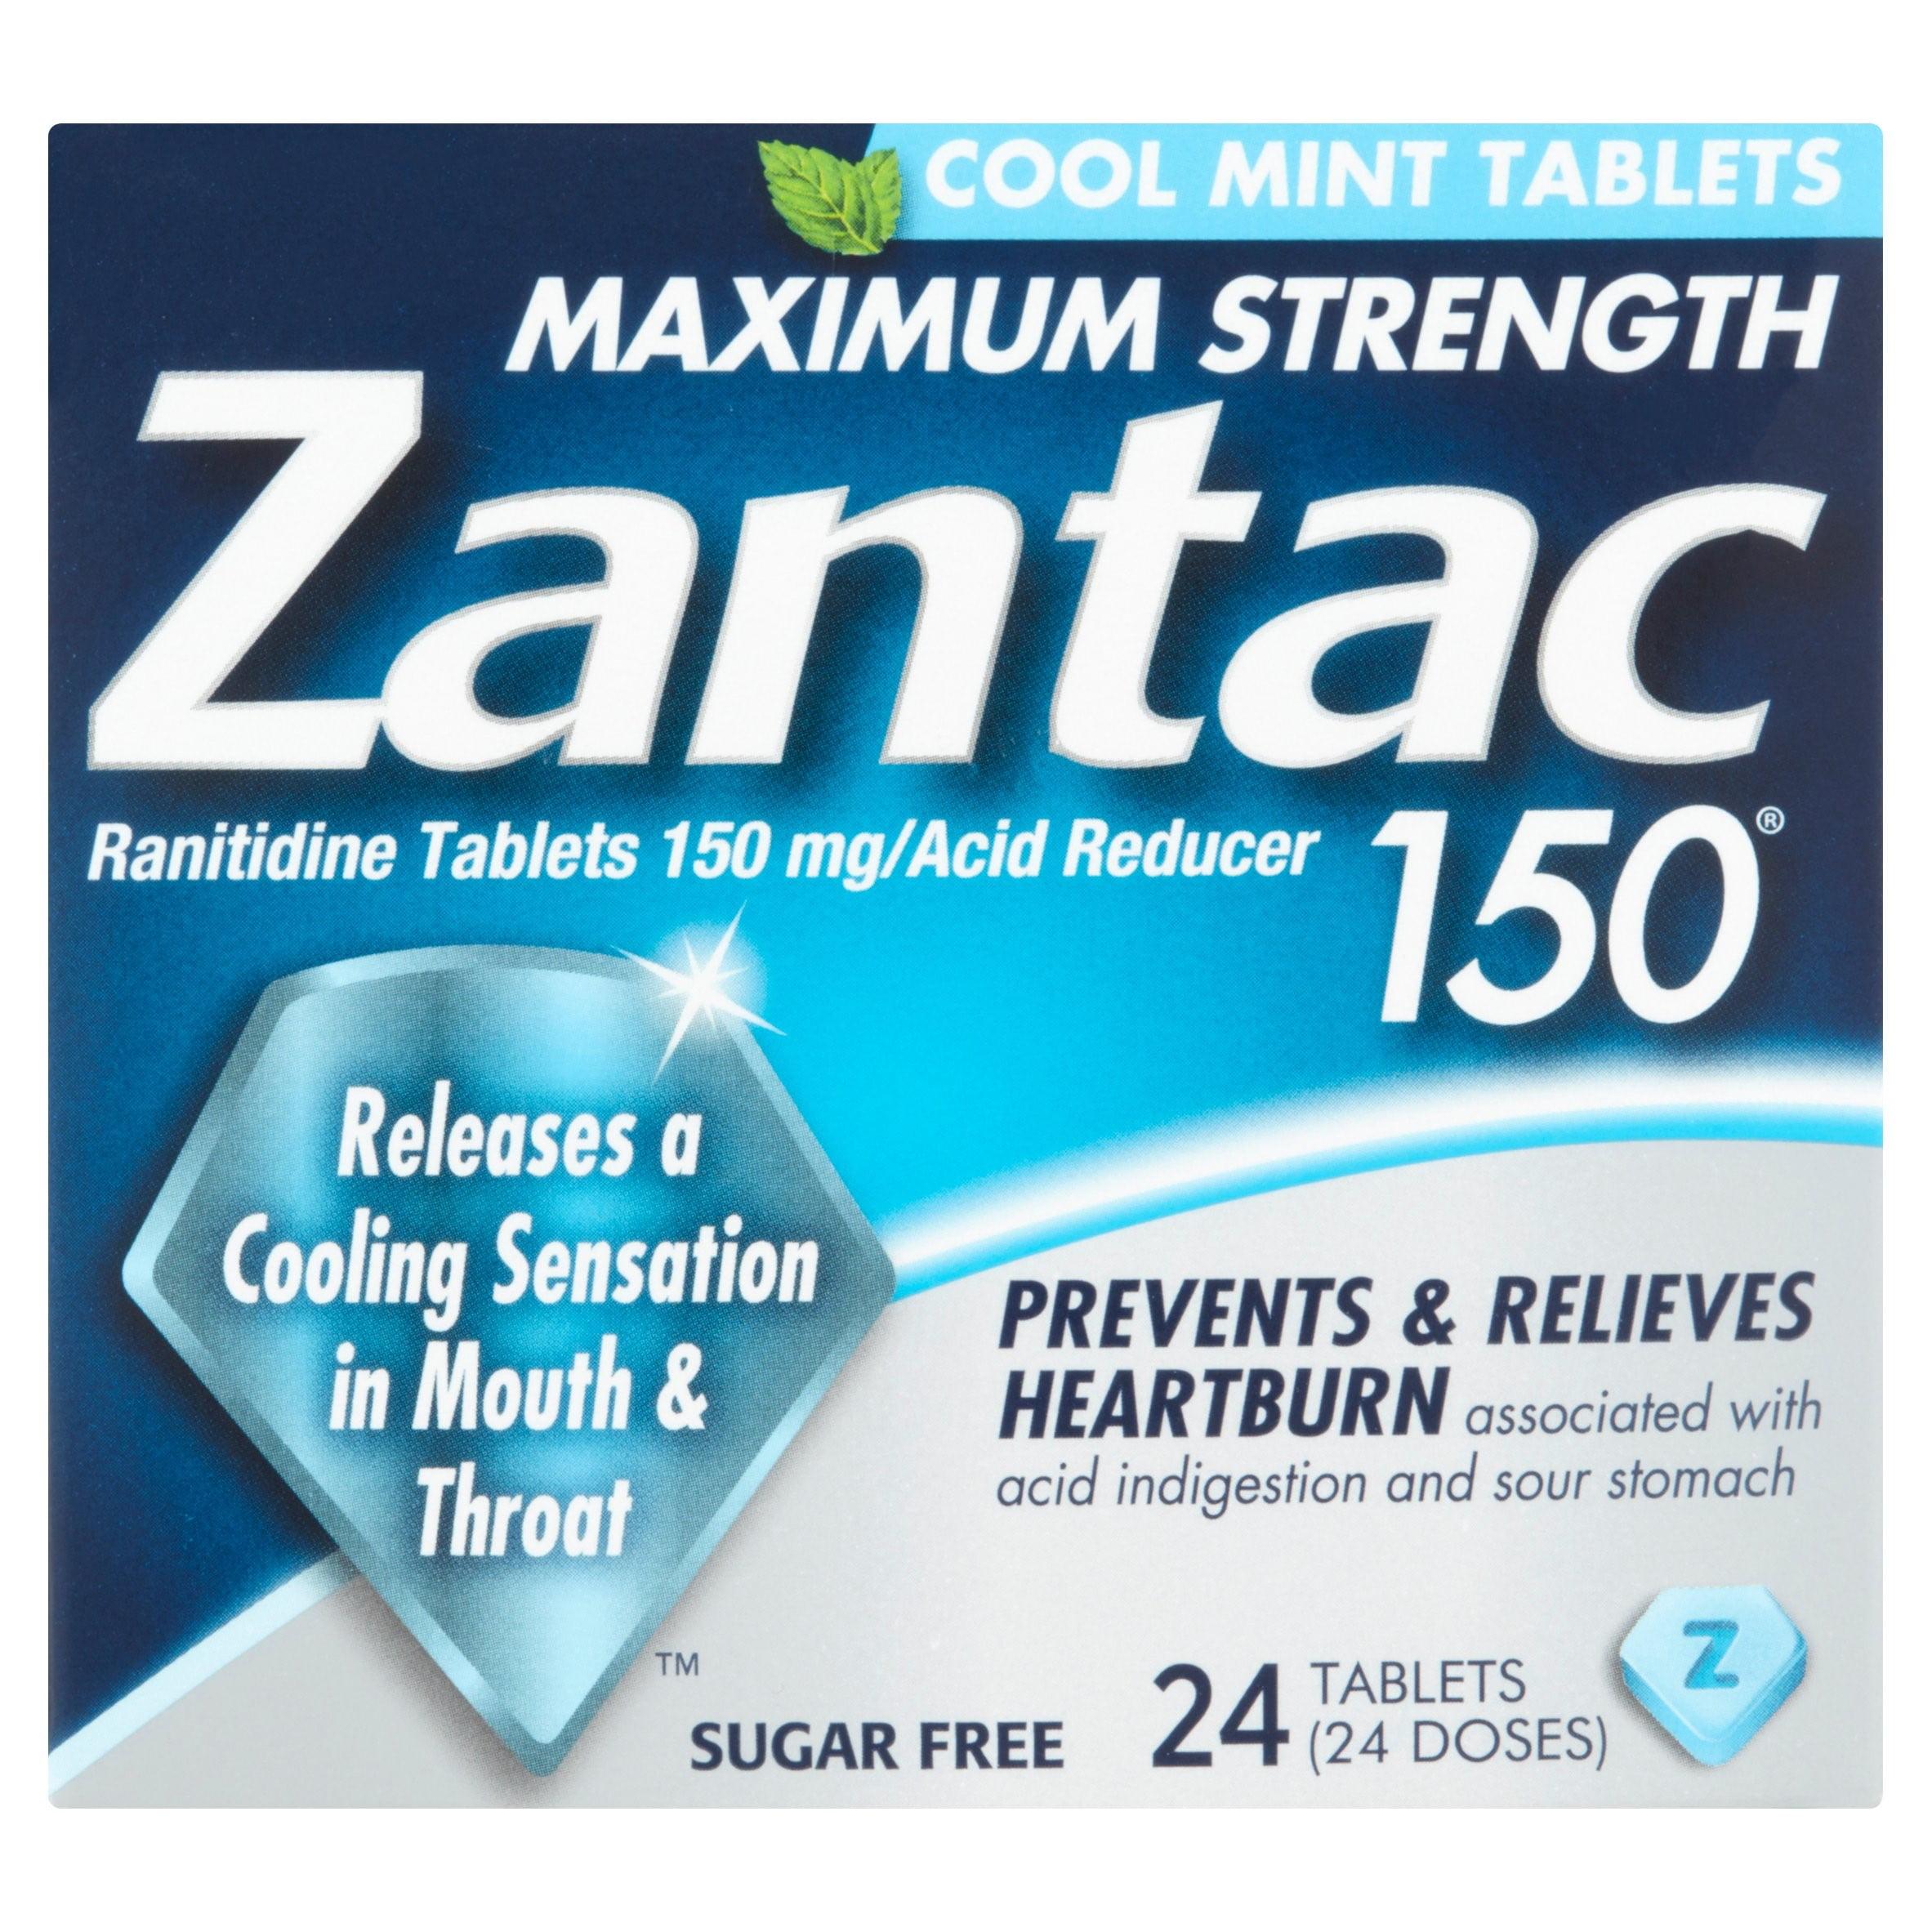 zantac 150 cool mint maximum strength ranitidine acid reducer